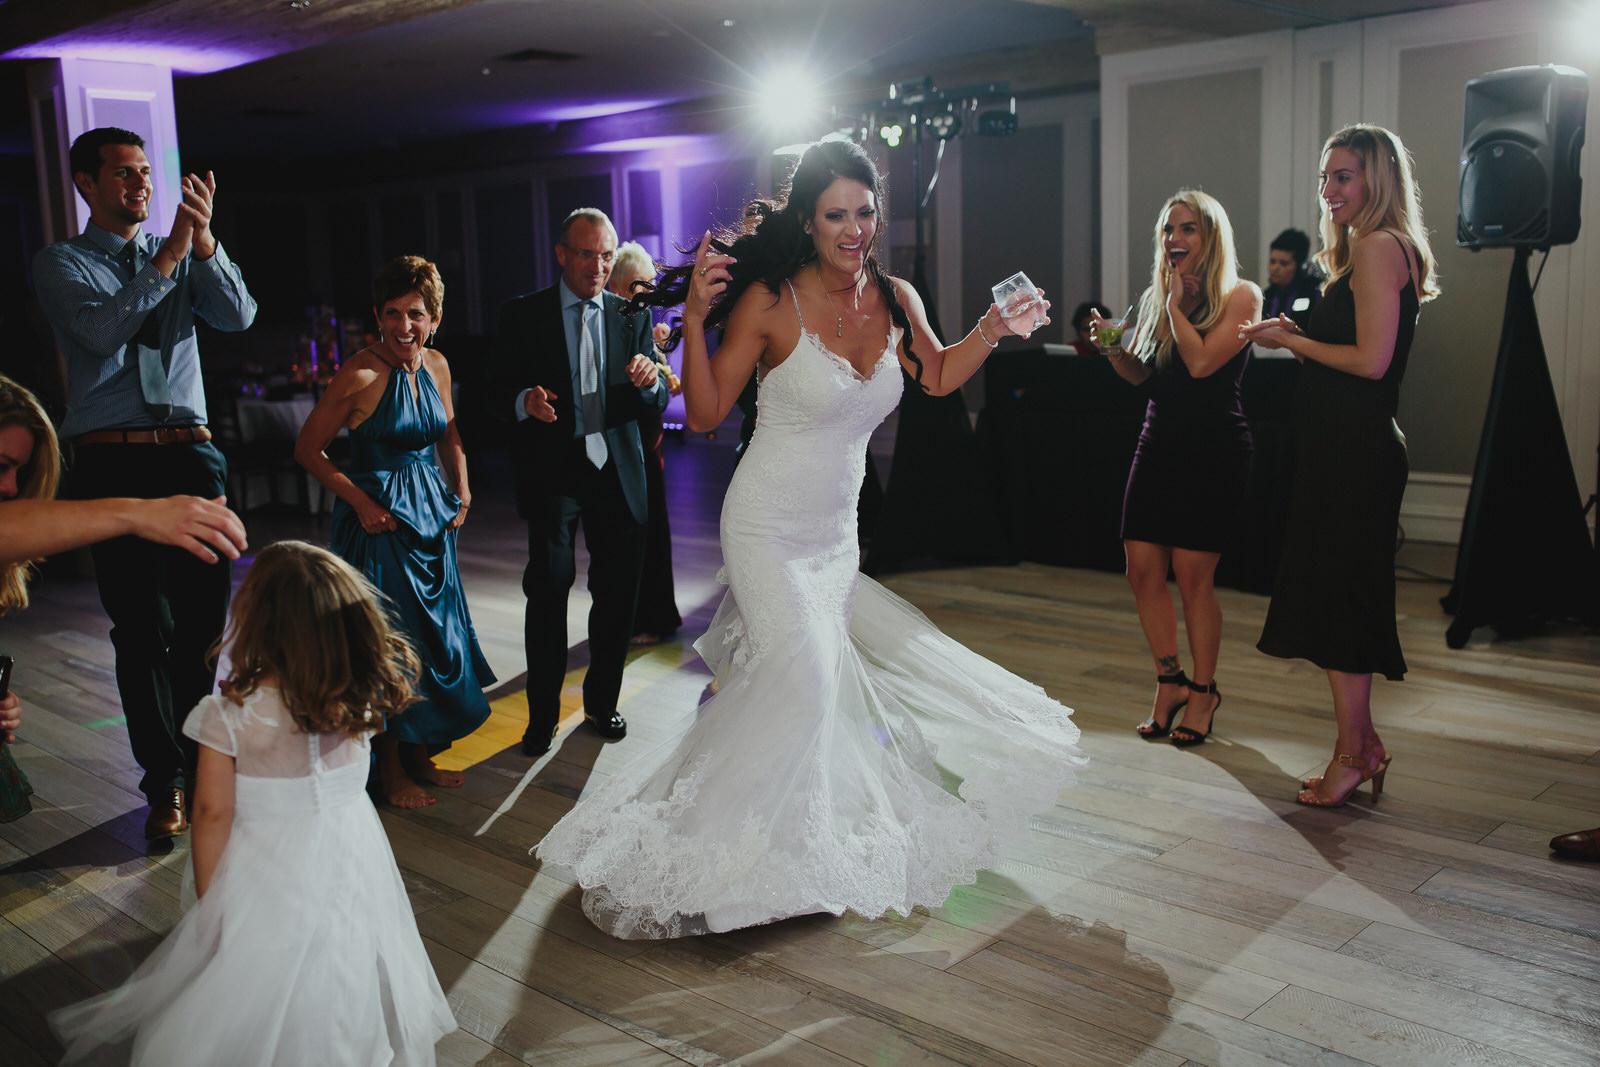 bride_dancing_tiny_house_photo_wedding_photojournalism.jpg